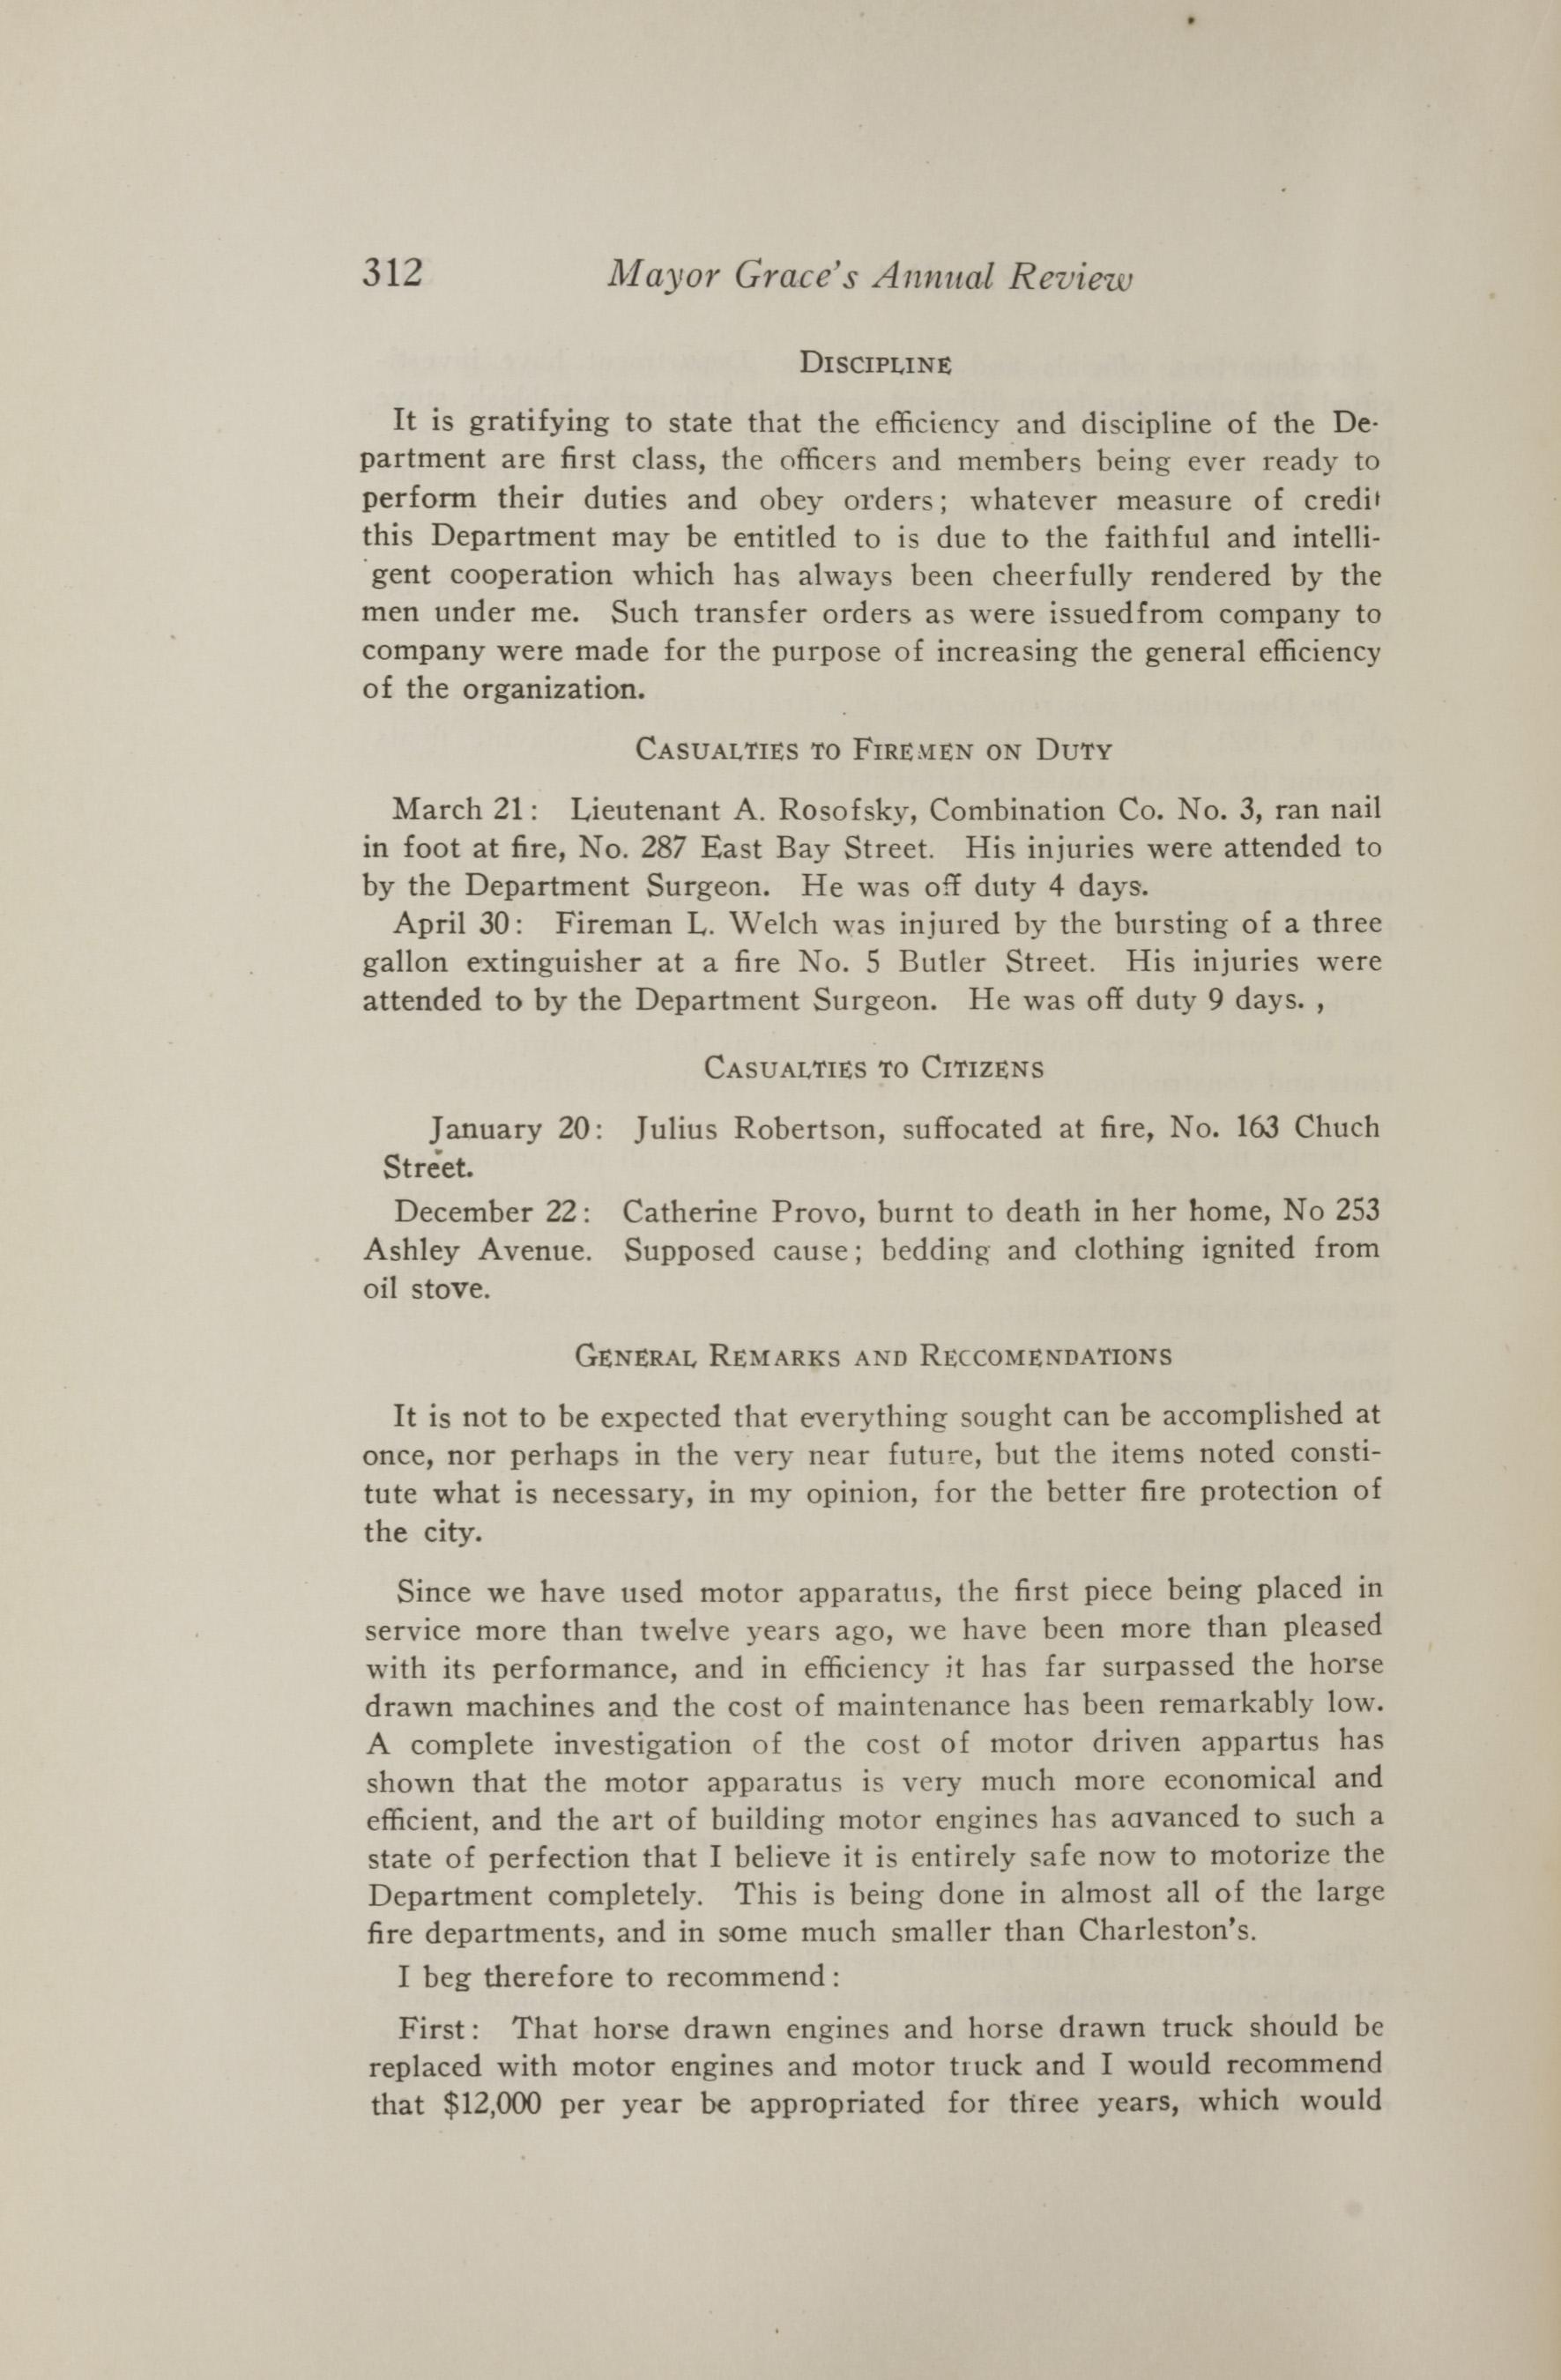 Charleston Yearbook, 1921, page 312